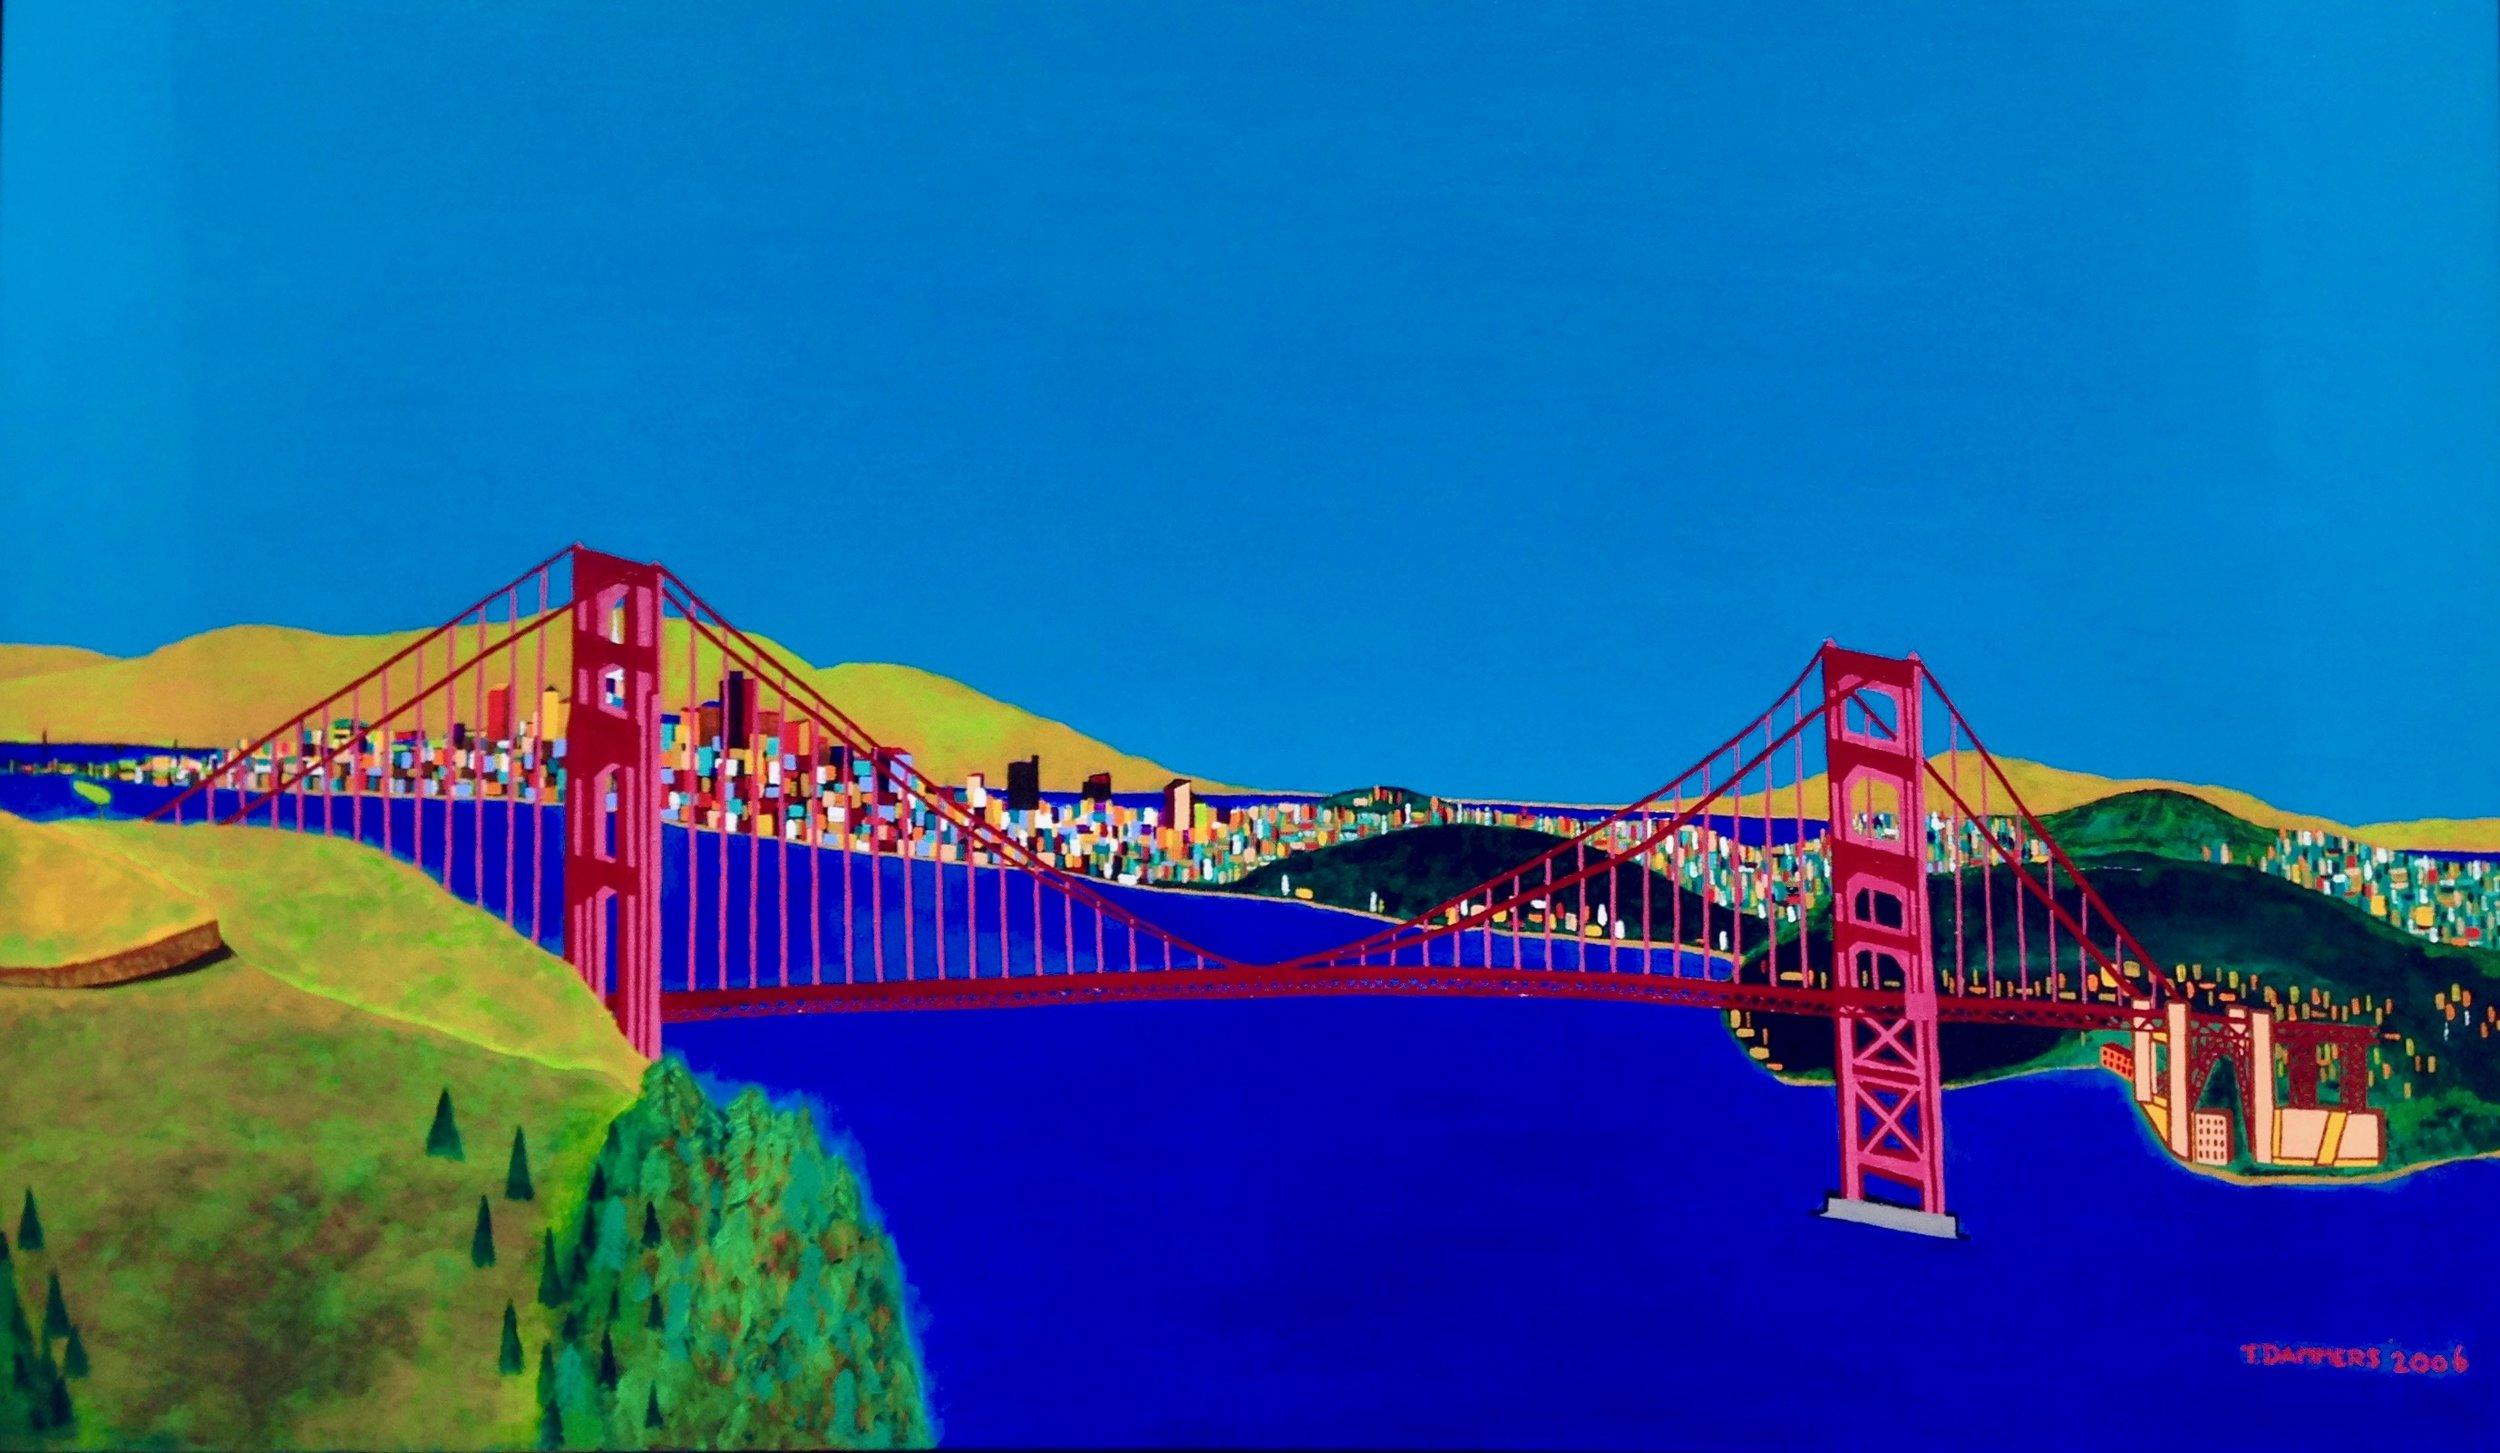 Golden Gate Bridge San Francisco   Golden Gate Bridge San Francisco, 2006, acryl/cotton, 31,5 x 47,2 inch  Copyright © F.Dammers Fine Art - All rights reserved.